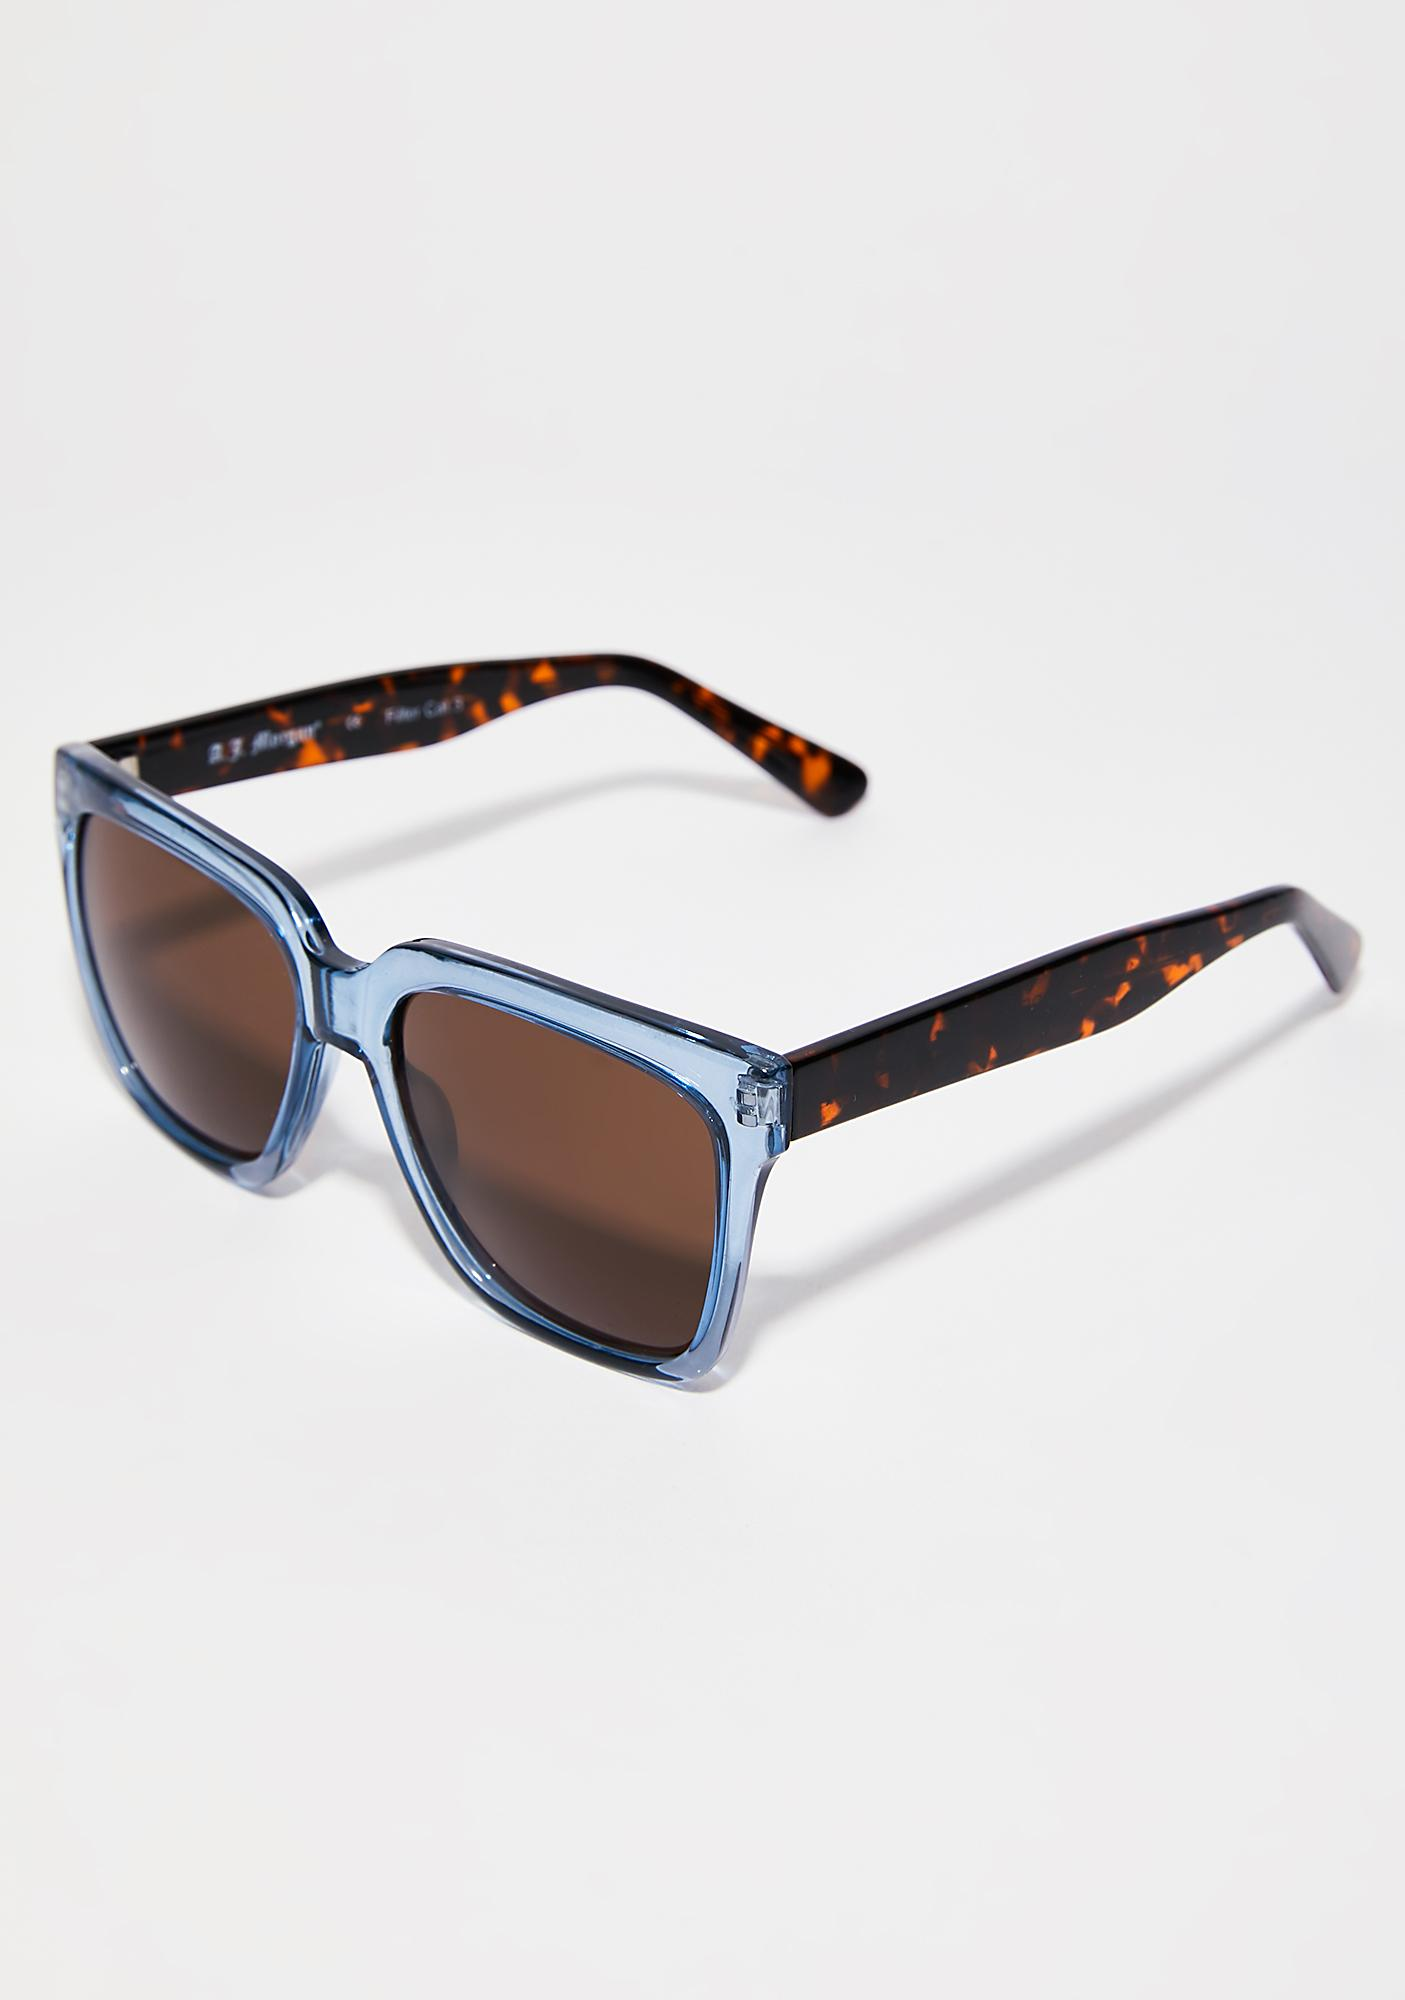 Ocean Vroom Sunglasses